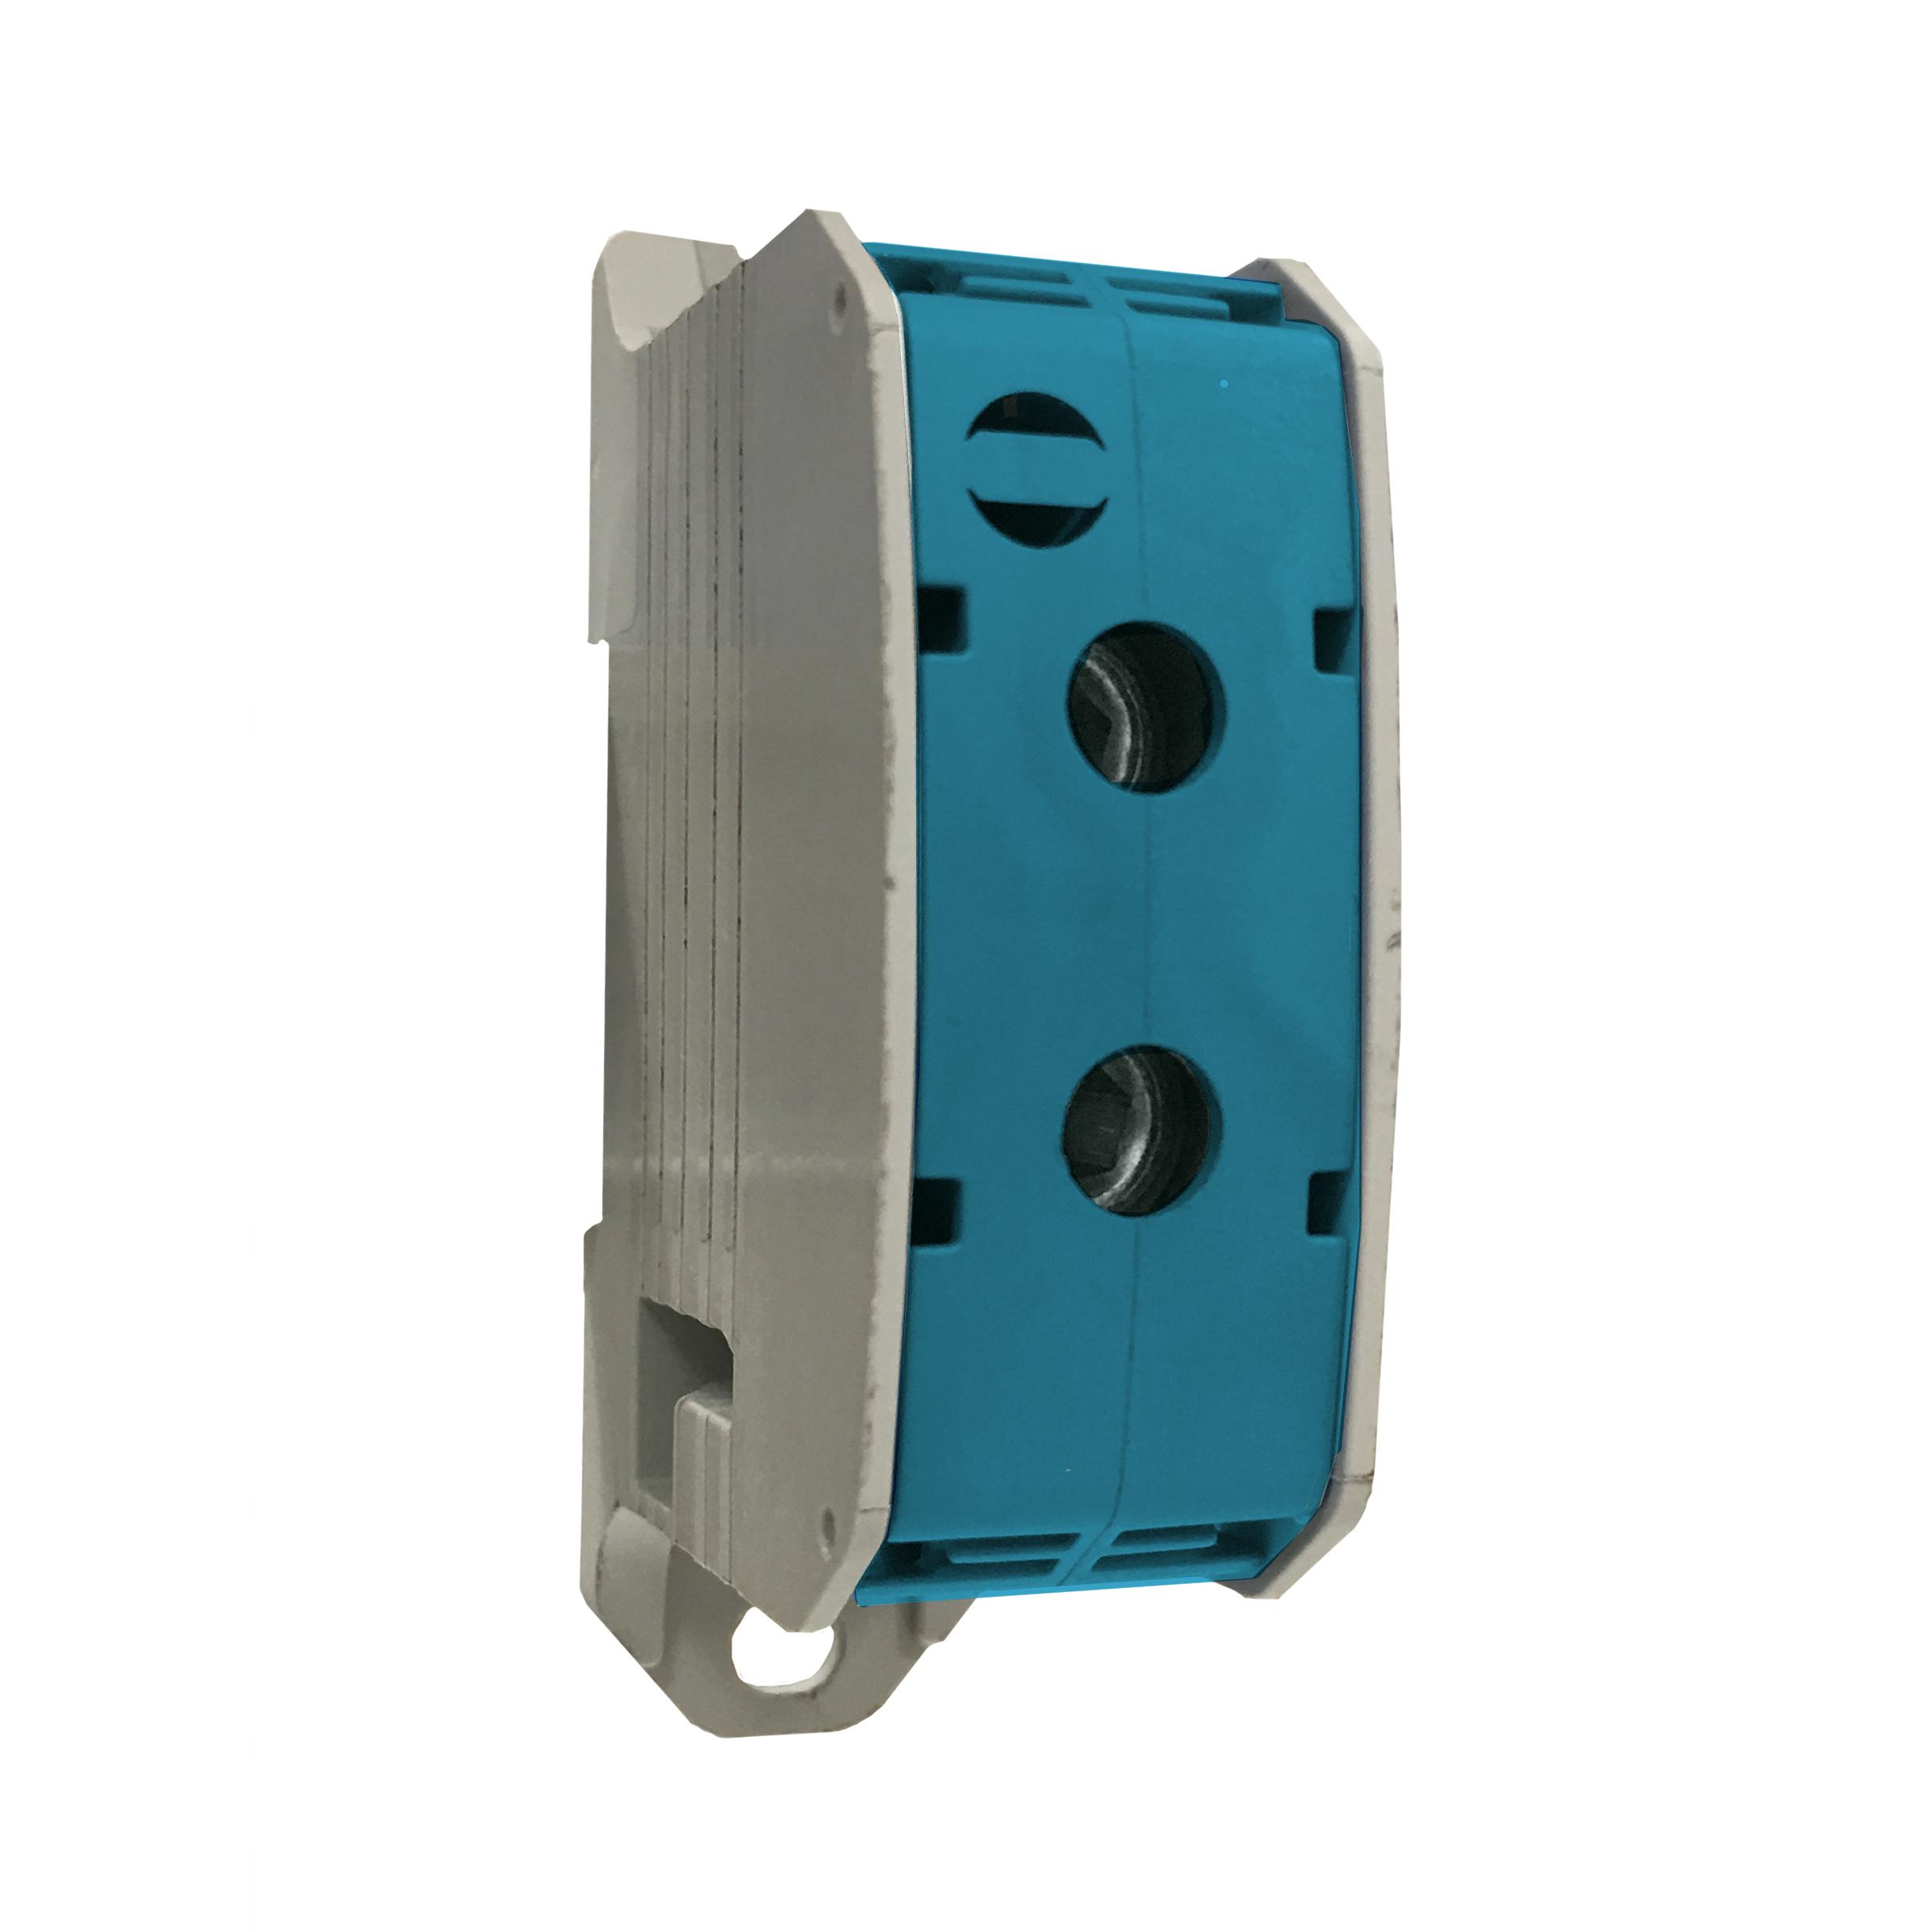 1 Stk Aluminium /Kupfer Klemme, 1-polig, 95mm² blau IKA21420--